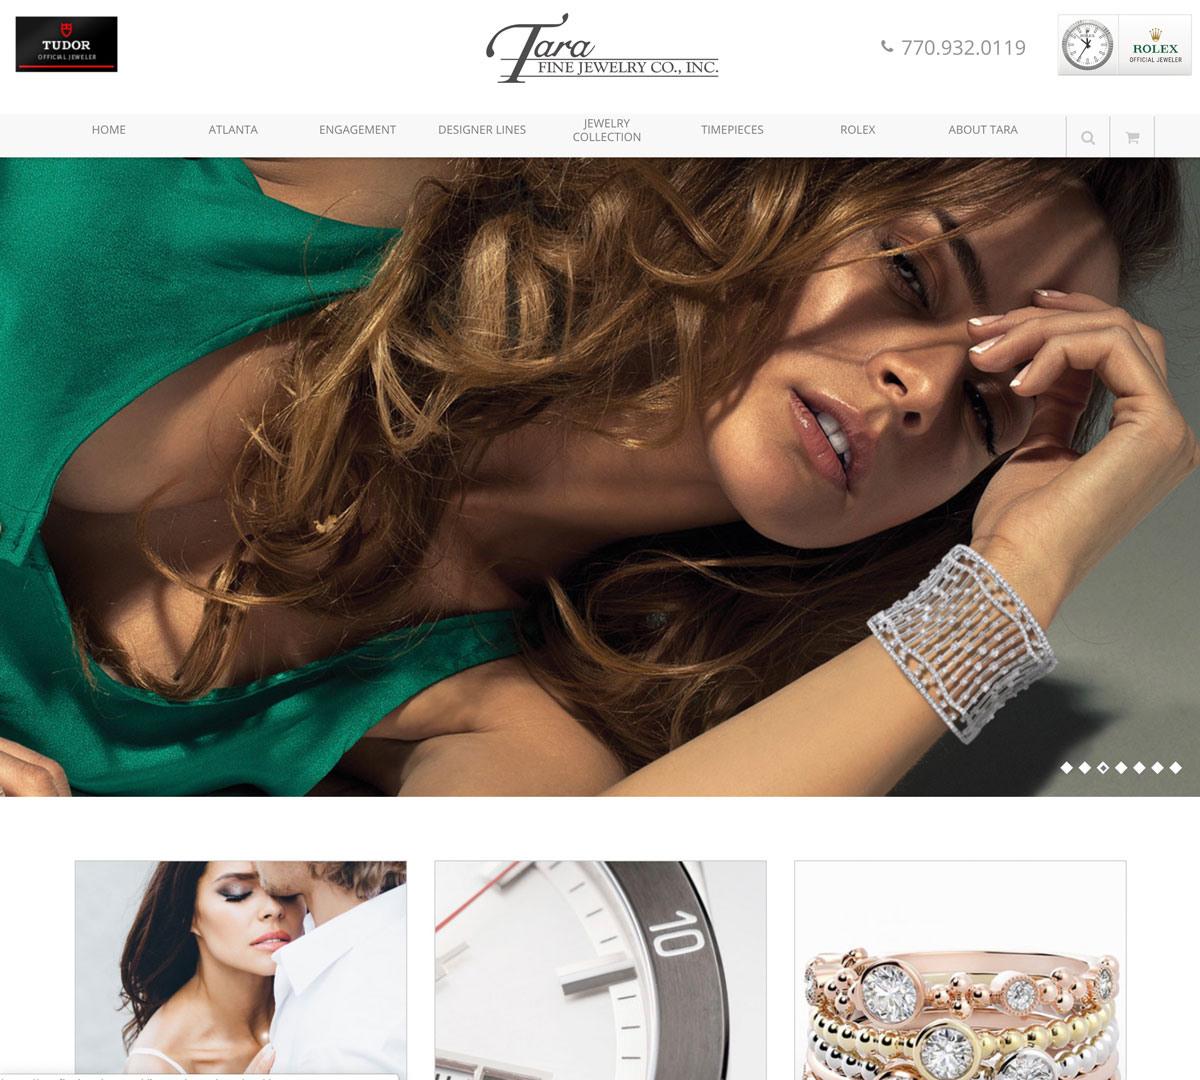 Image of website for Tara Fine Jewelry